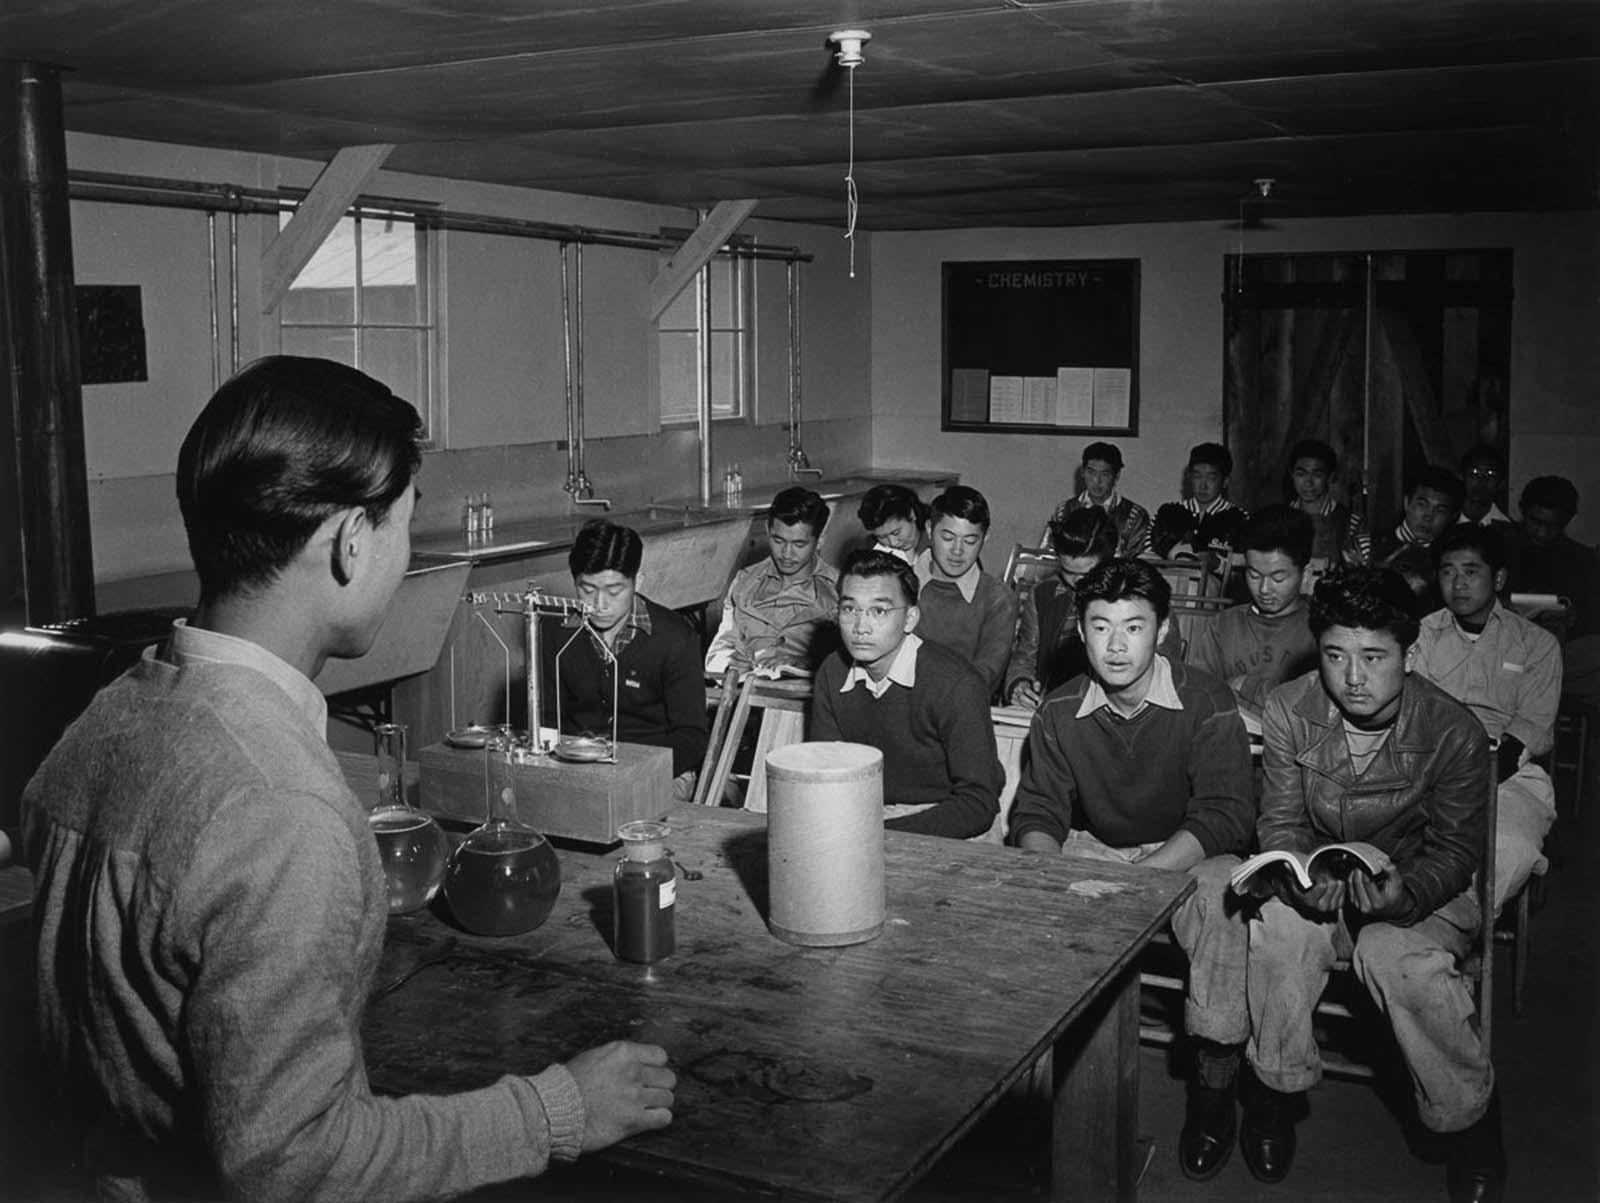 manzanar internment camp photographs